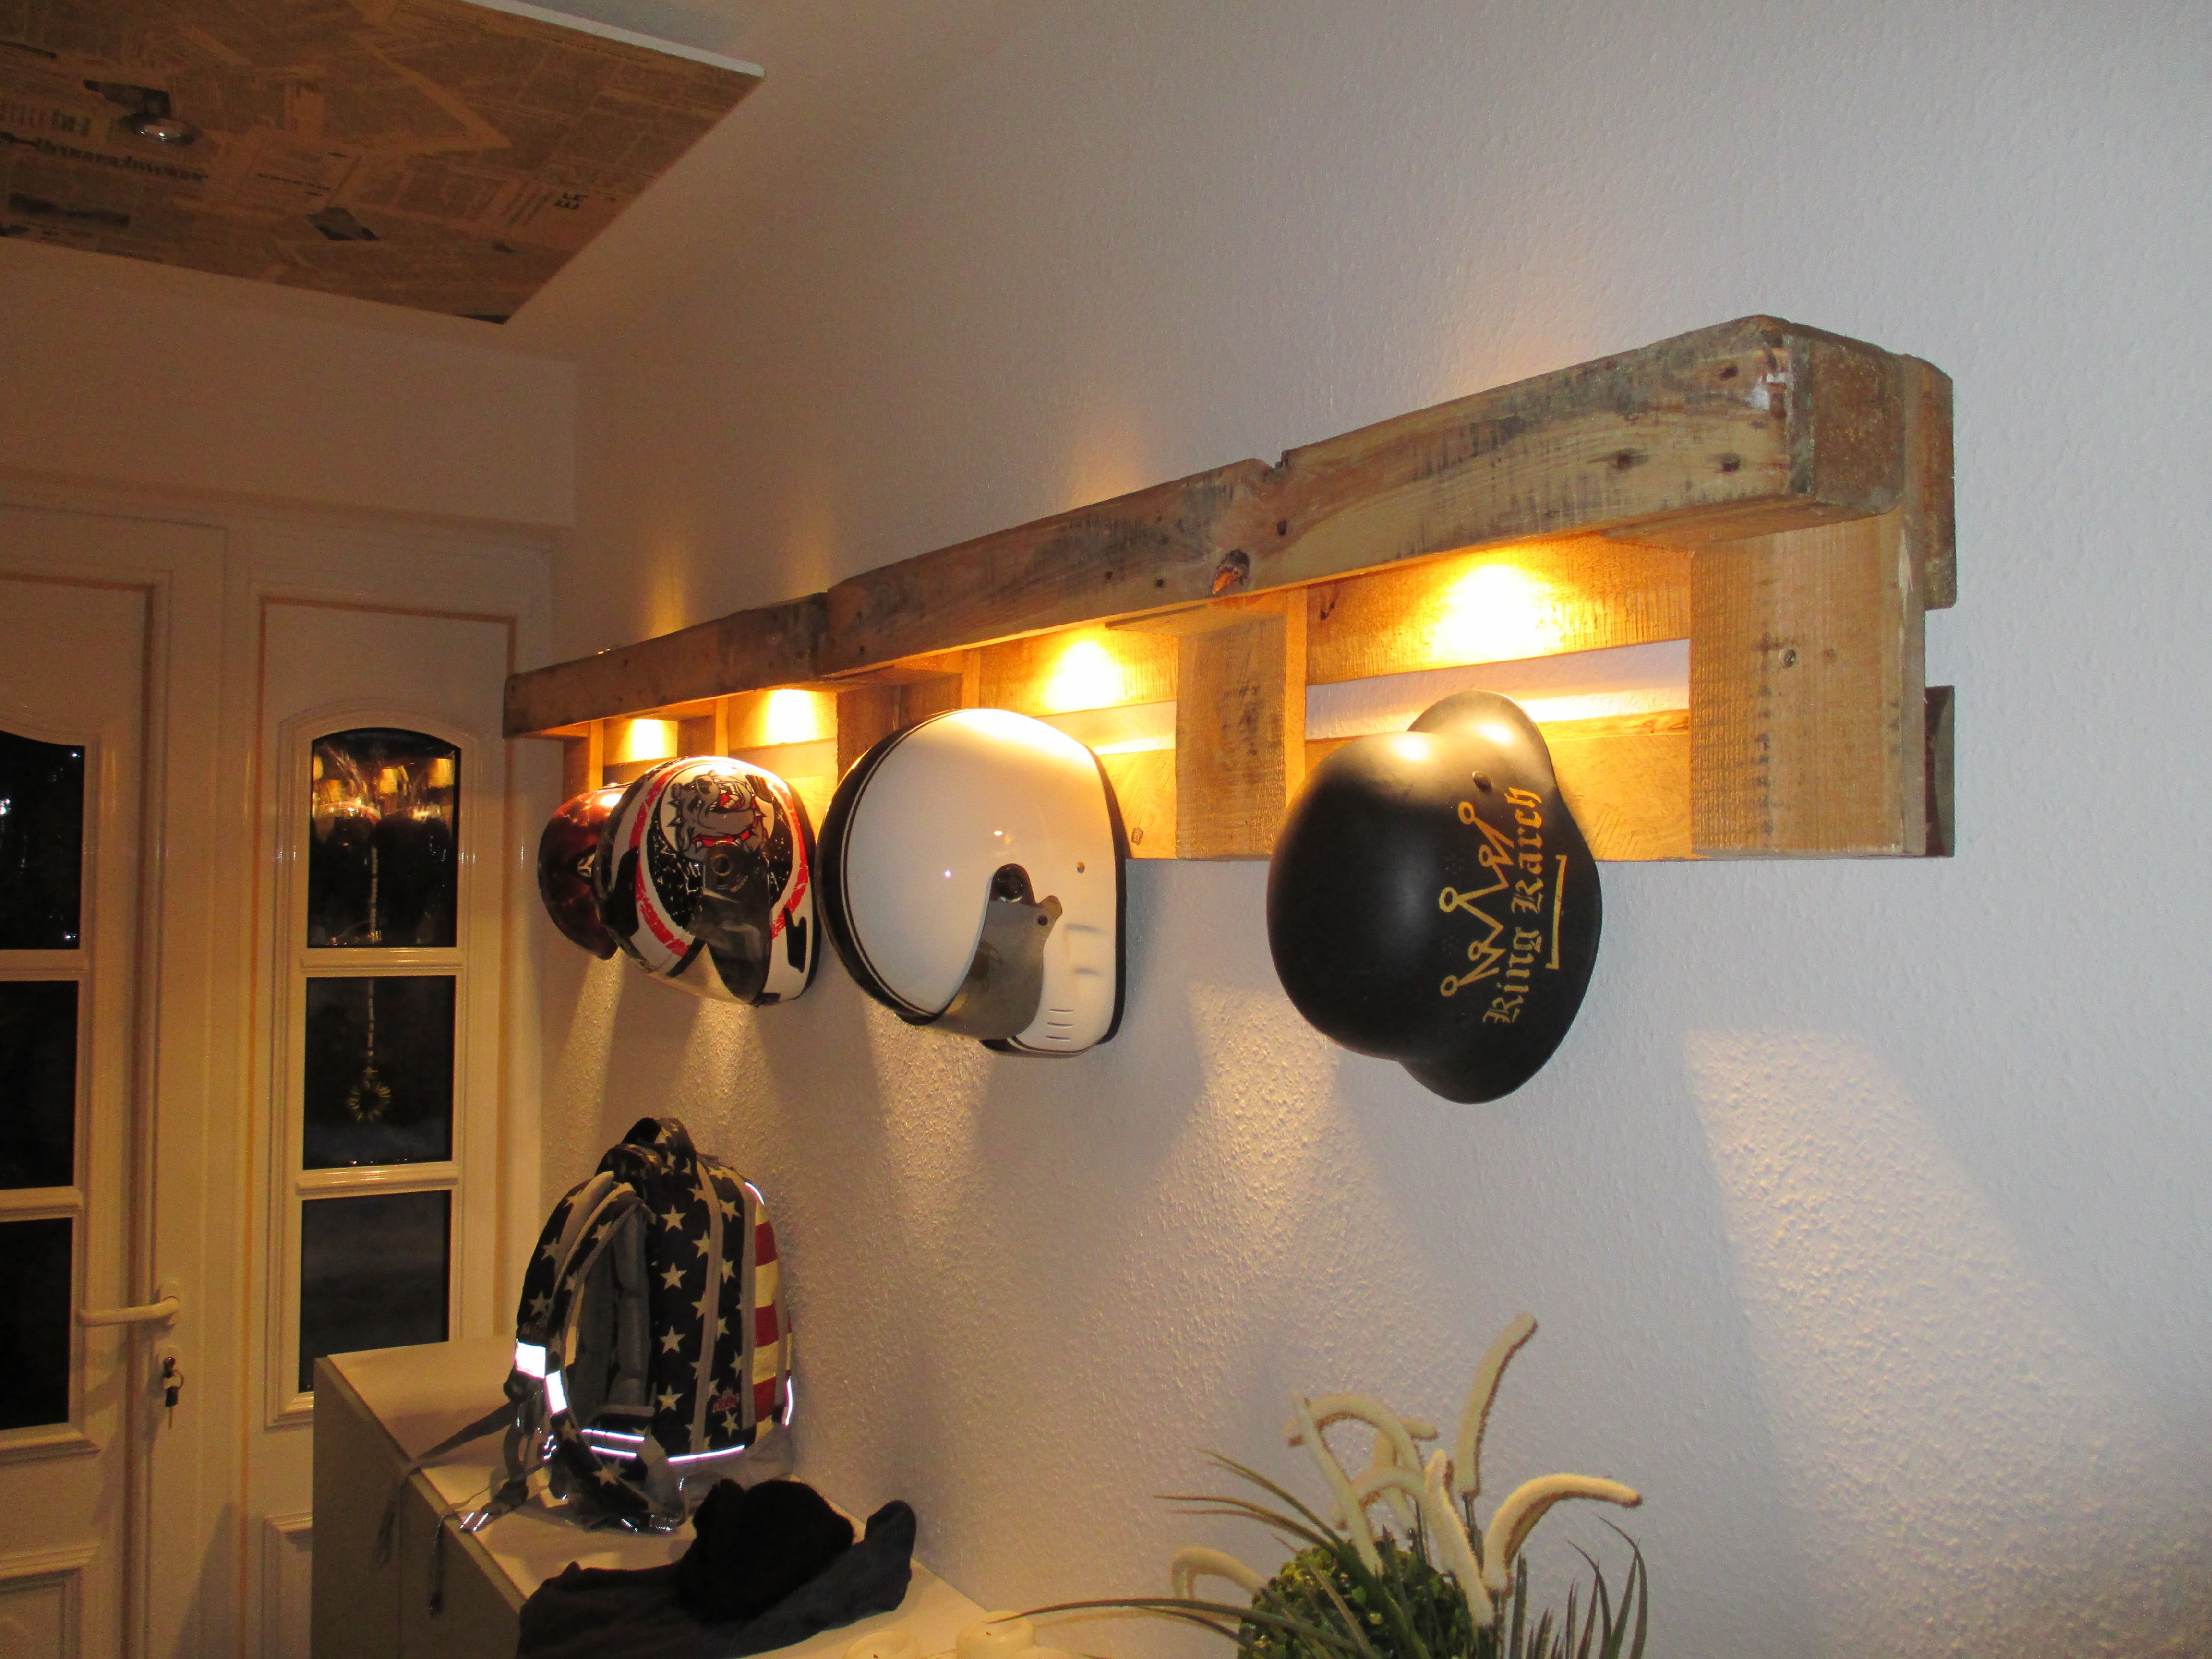 Helmhalter Aus Europaletten Mit Integrierter Led Beleuchtung Helmhalter Deko Ideen Schoner Wohnen